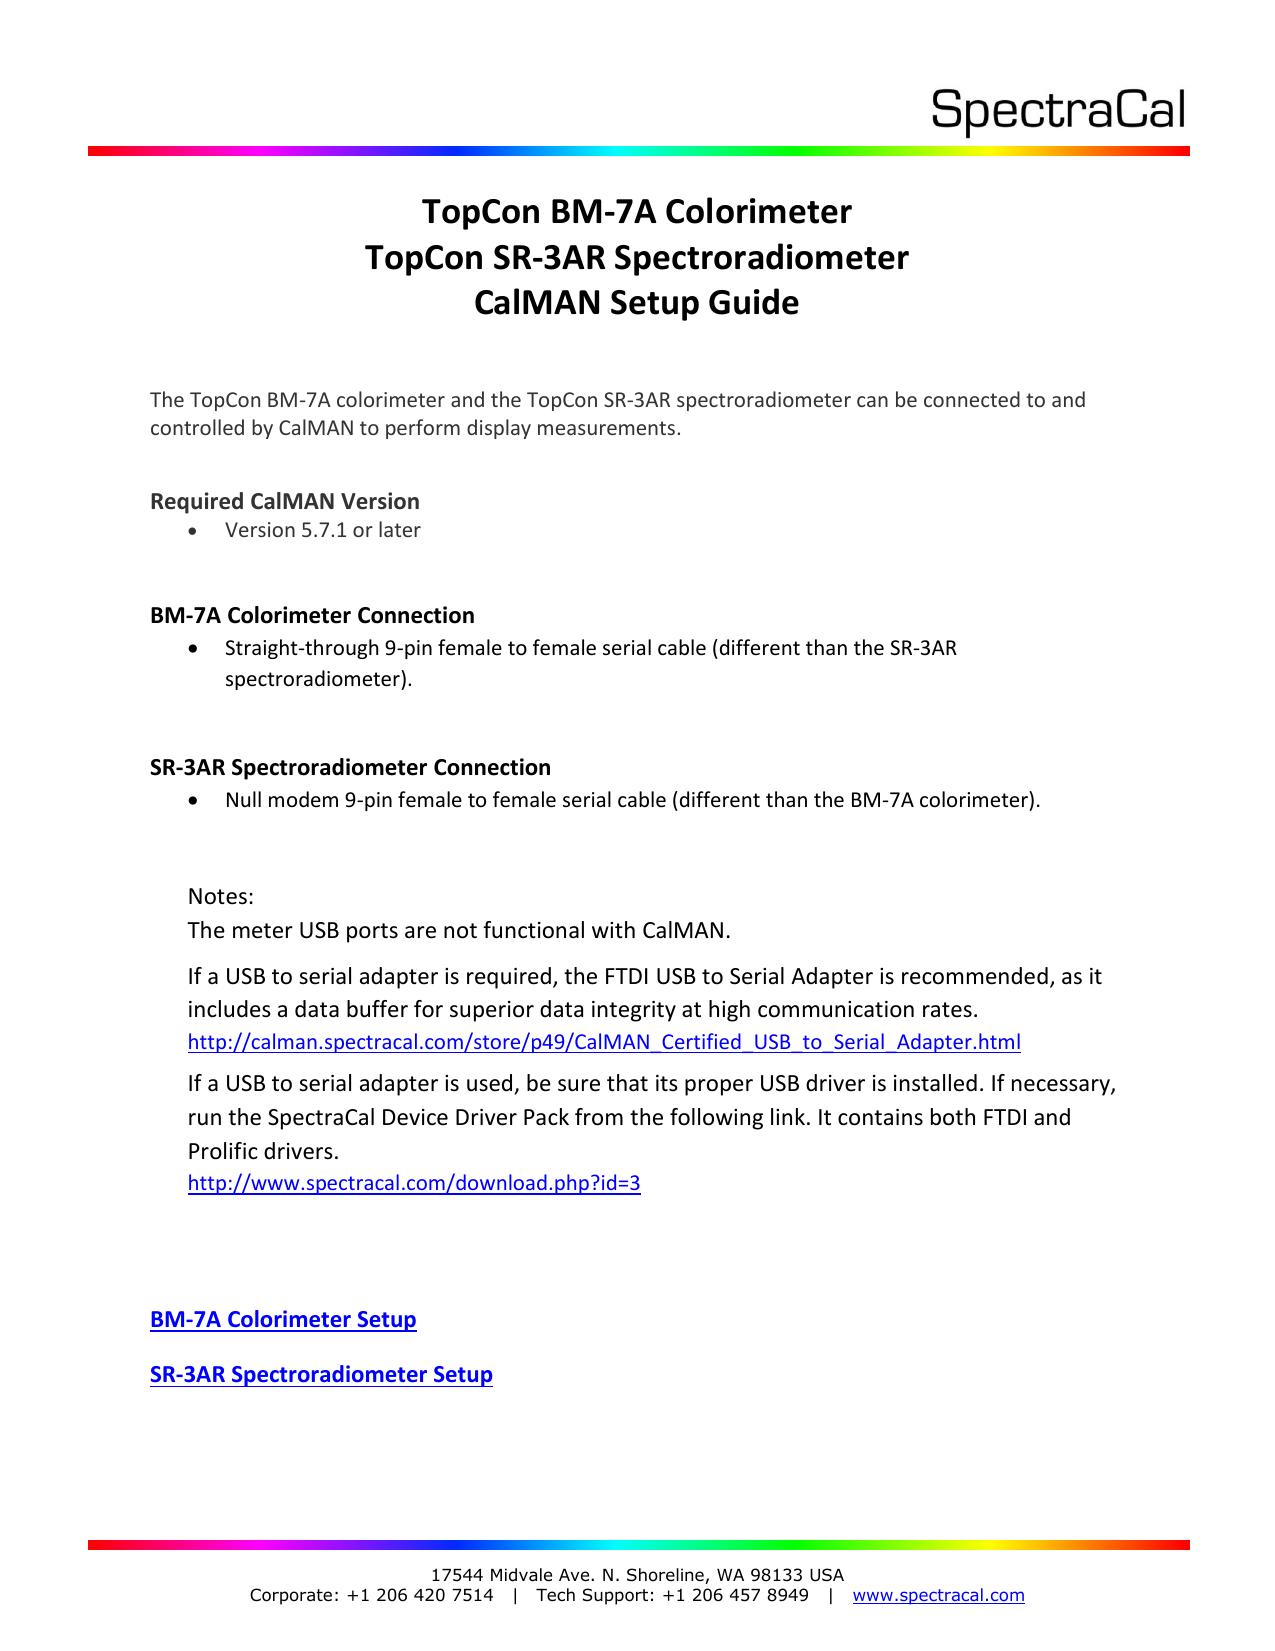 TopCon BM-7A Colorimeter TopCon SR-3AR | manualzz com